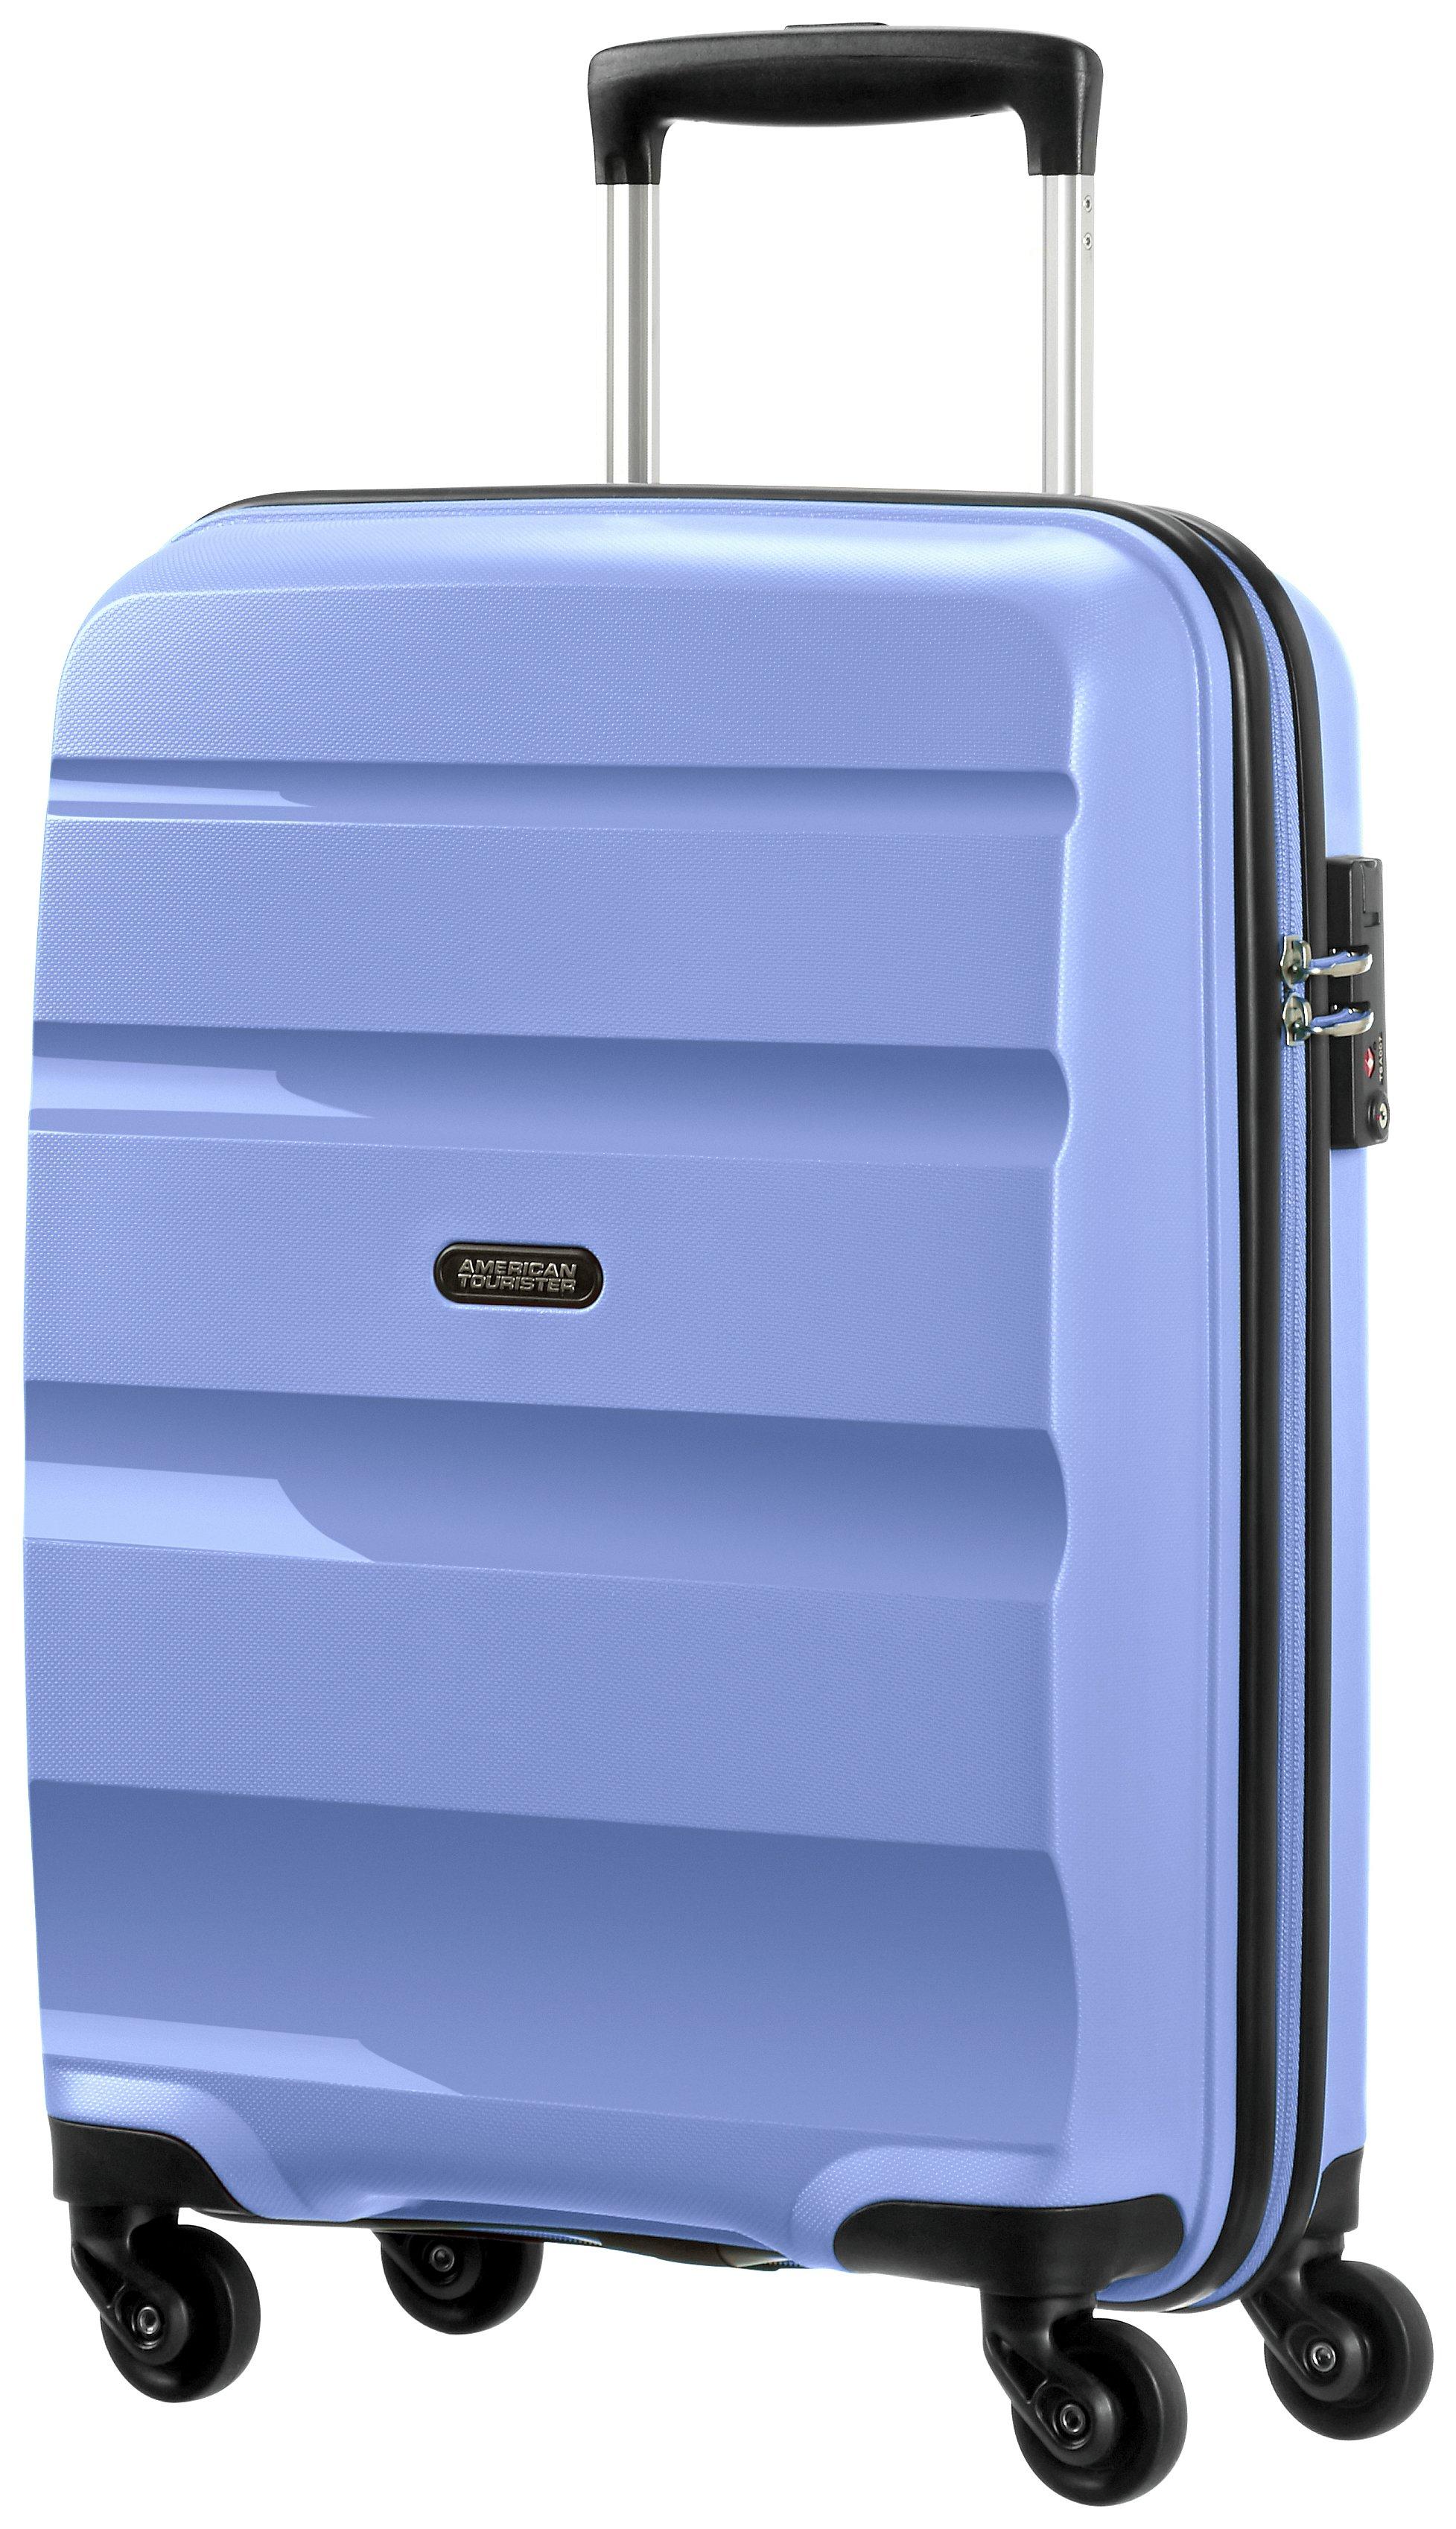 Image of American Tourister Bon Air 31.5 litre 4 Wheel Suitcase - Blue